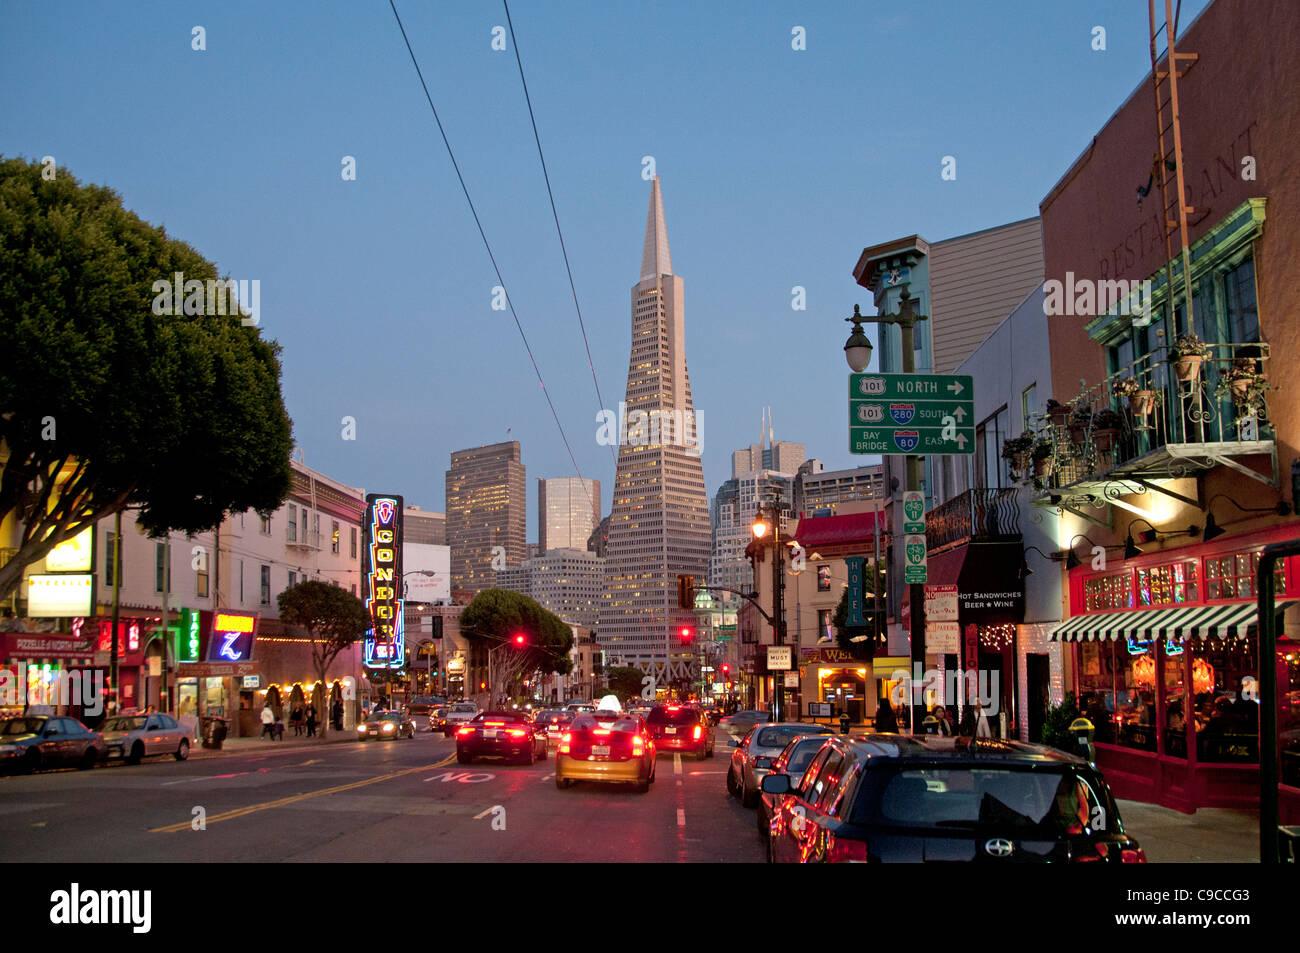 Restaurant Bar Cafe Little Italy San Francisco California